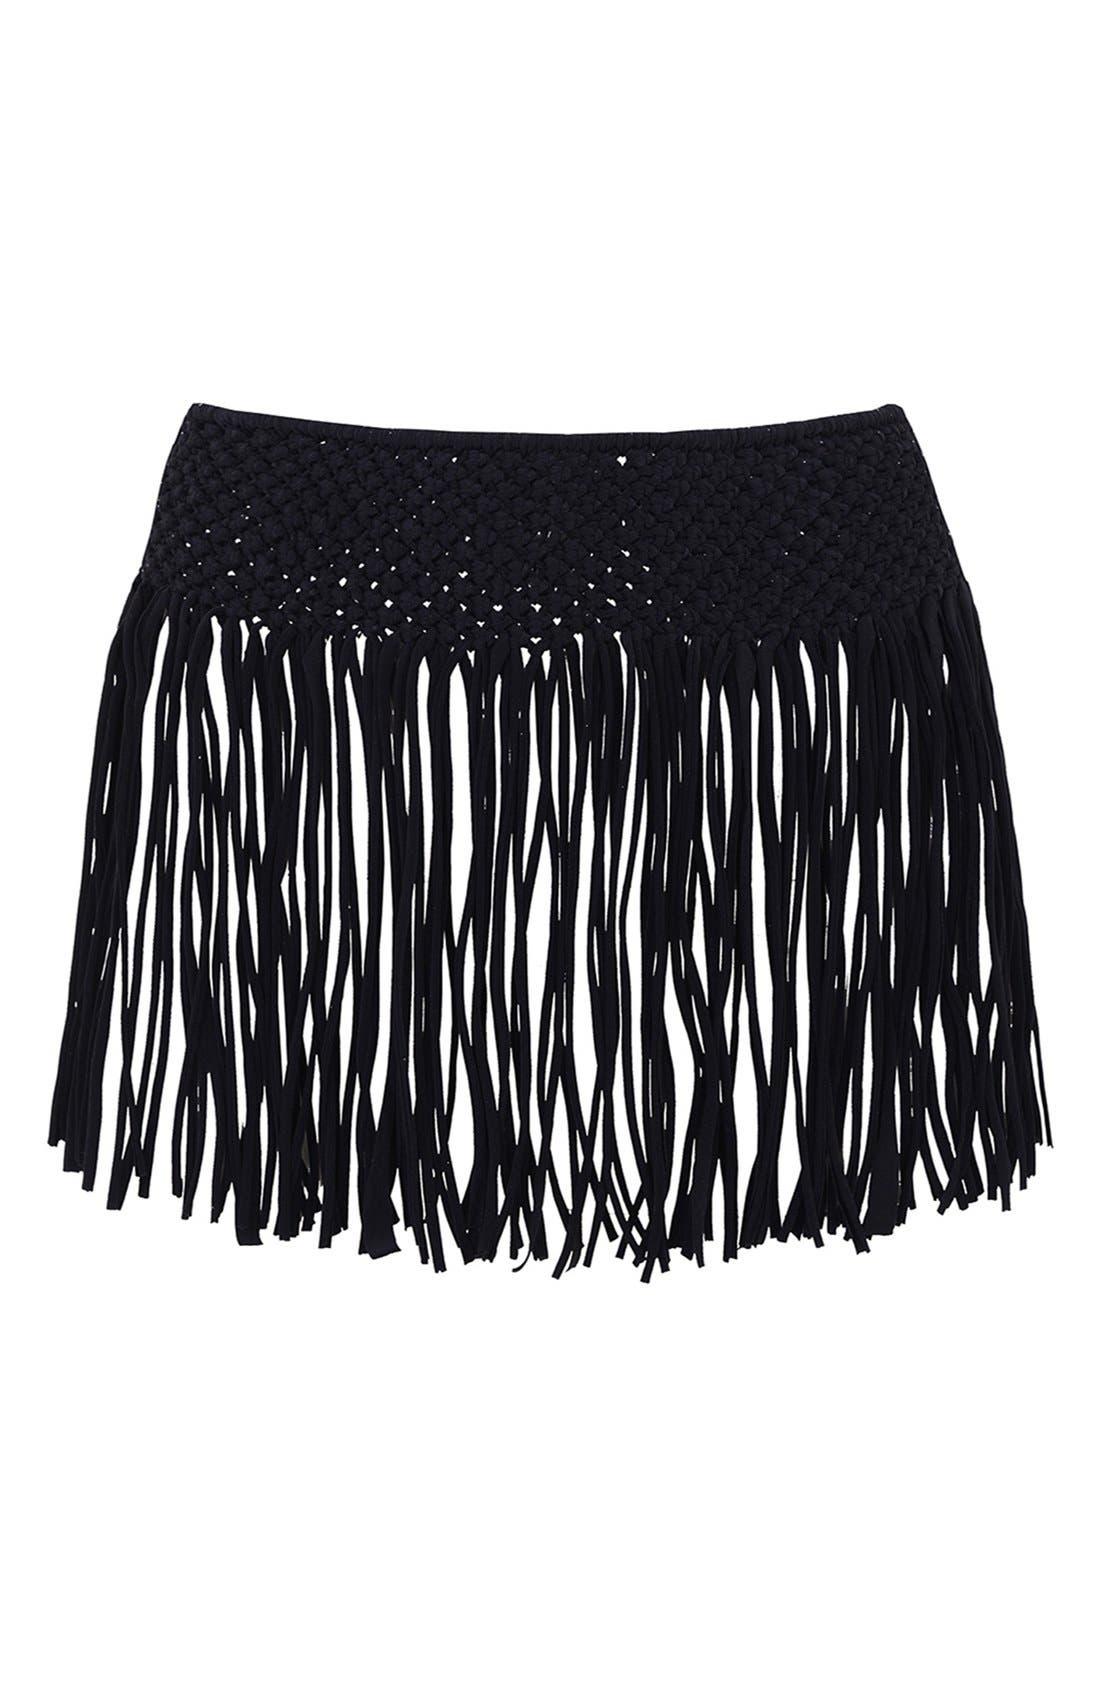 Alternate Image 2  - KENDALL + KYLIE at Topshop Macramé Fringe Cover-Up Skirt